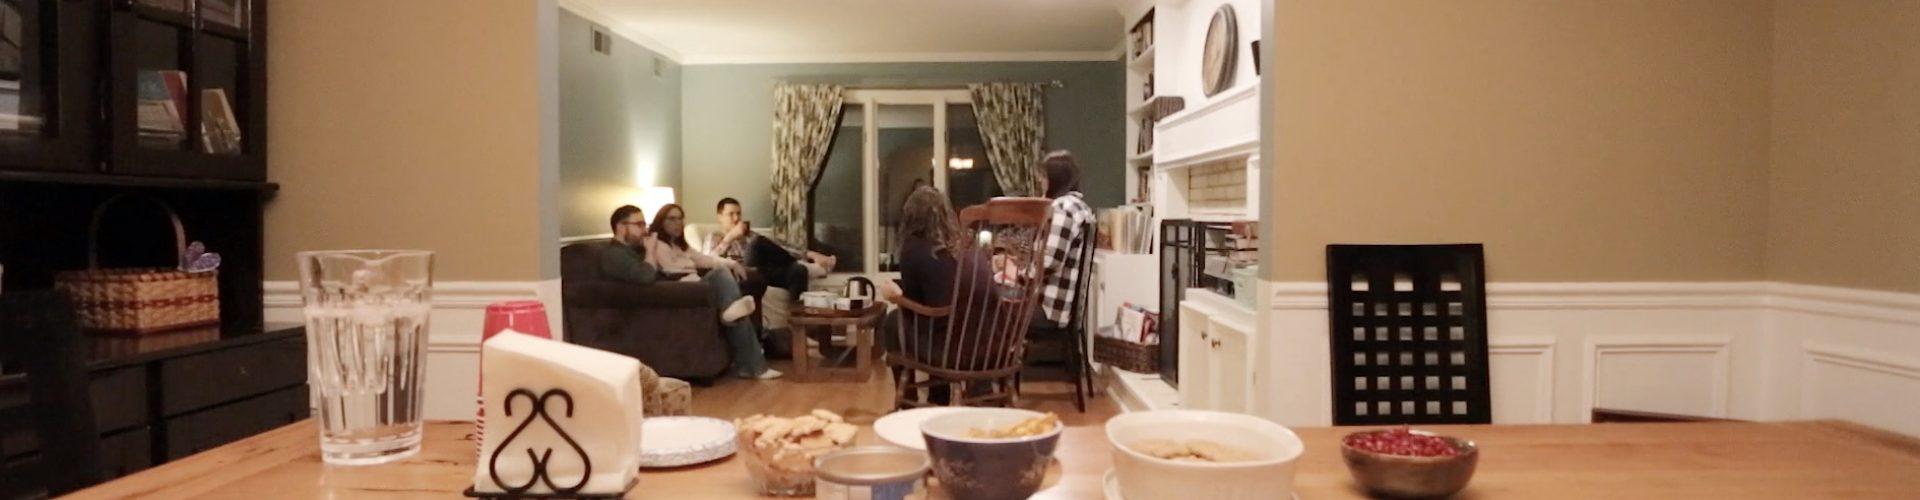 RezGroup Home Small Group Table Snacks